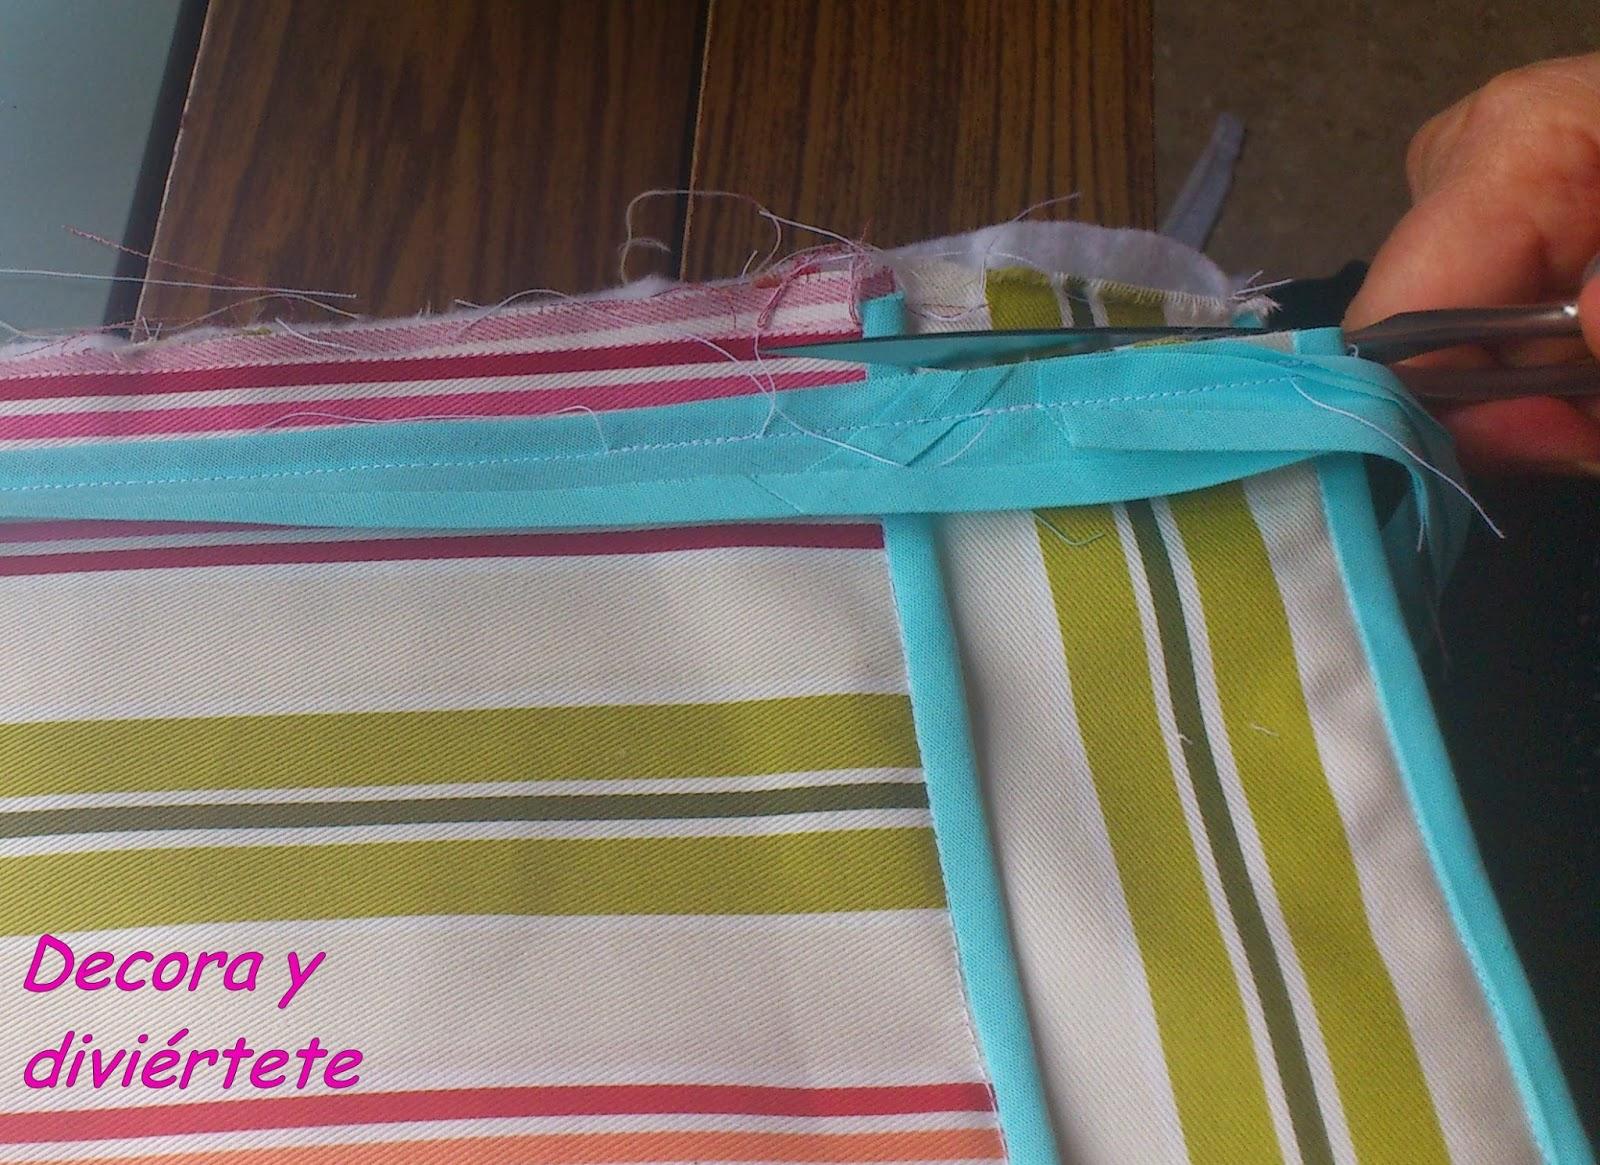 Decora y divi rtete un tutorial para hacerte un zapatero for Zapatero de tela barato